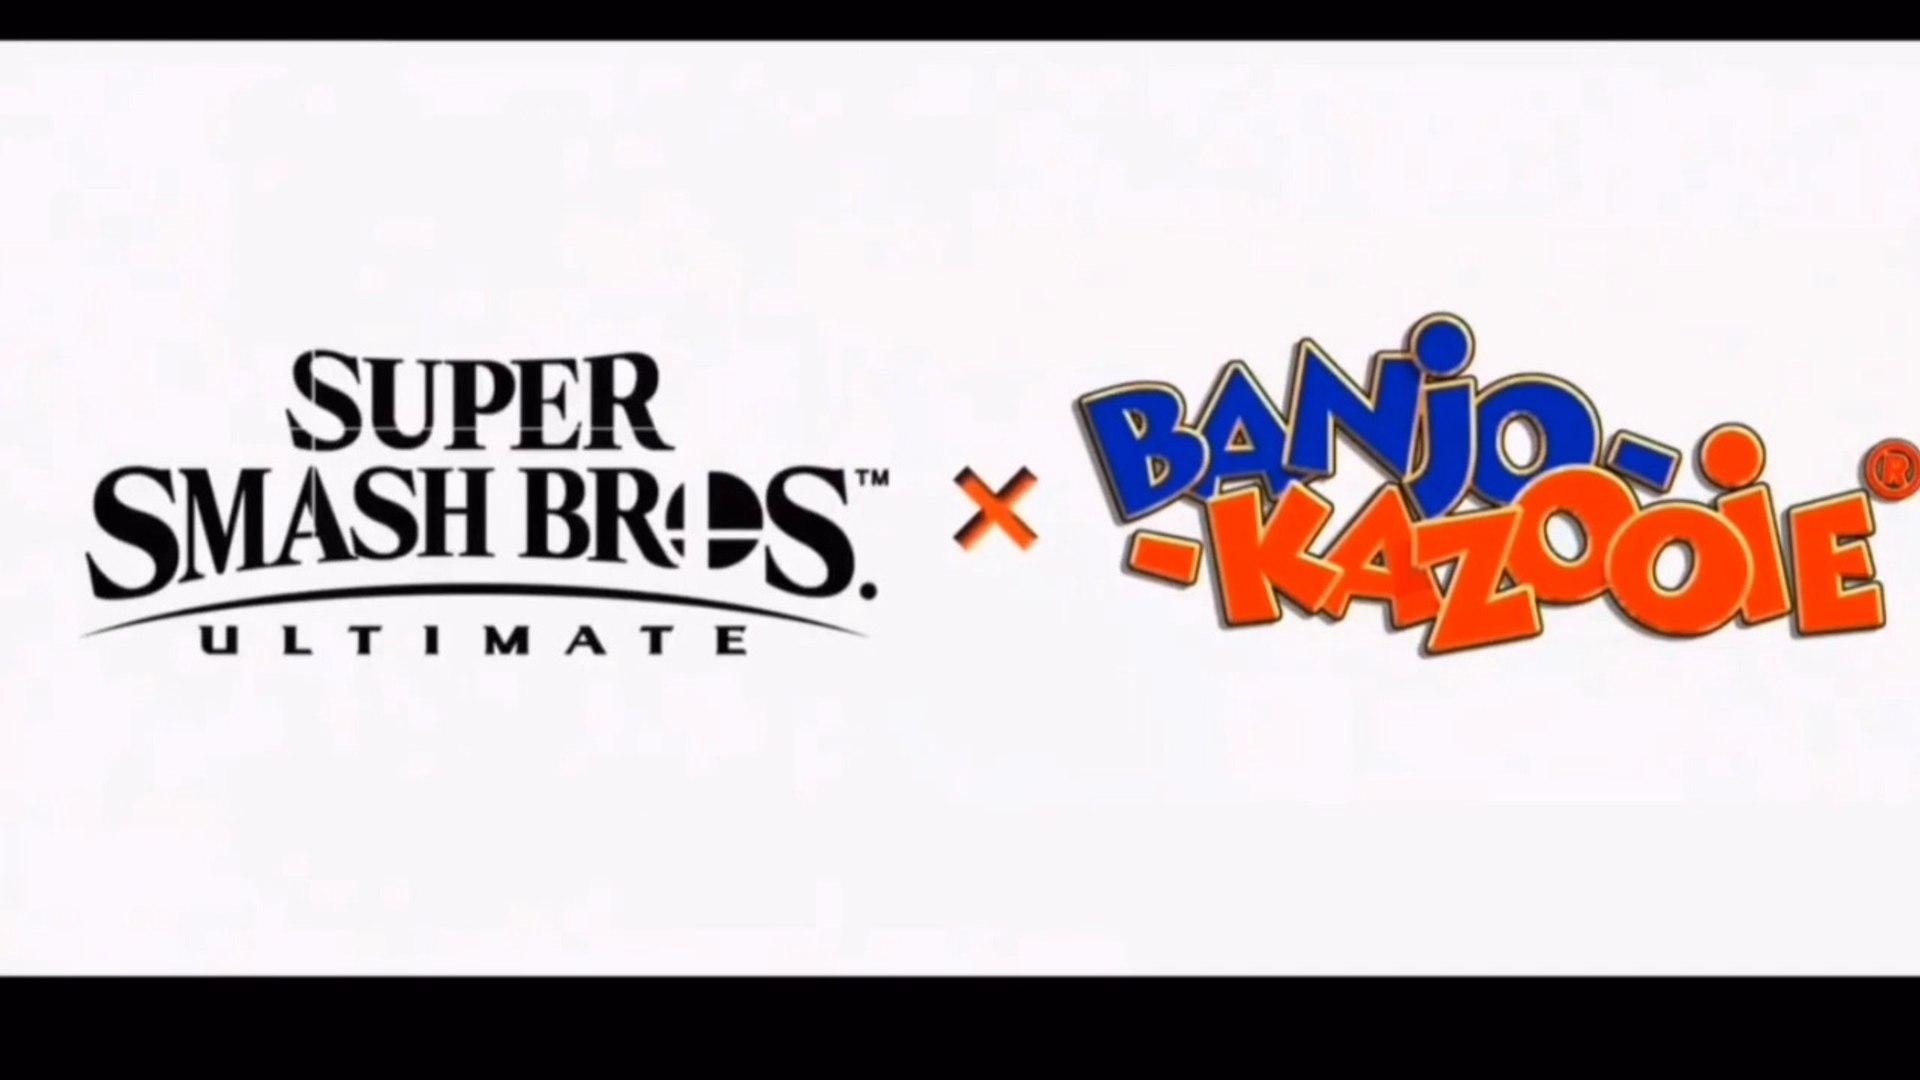 SUPER SMASH BROS. ULTIMATE - Banjo-Kazooei Reveal Trailer E3 2019